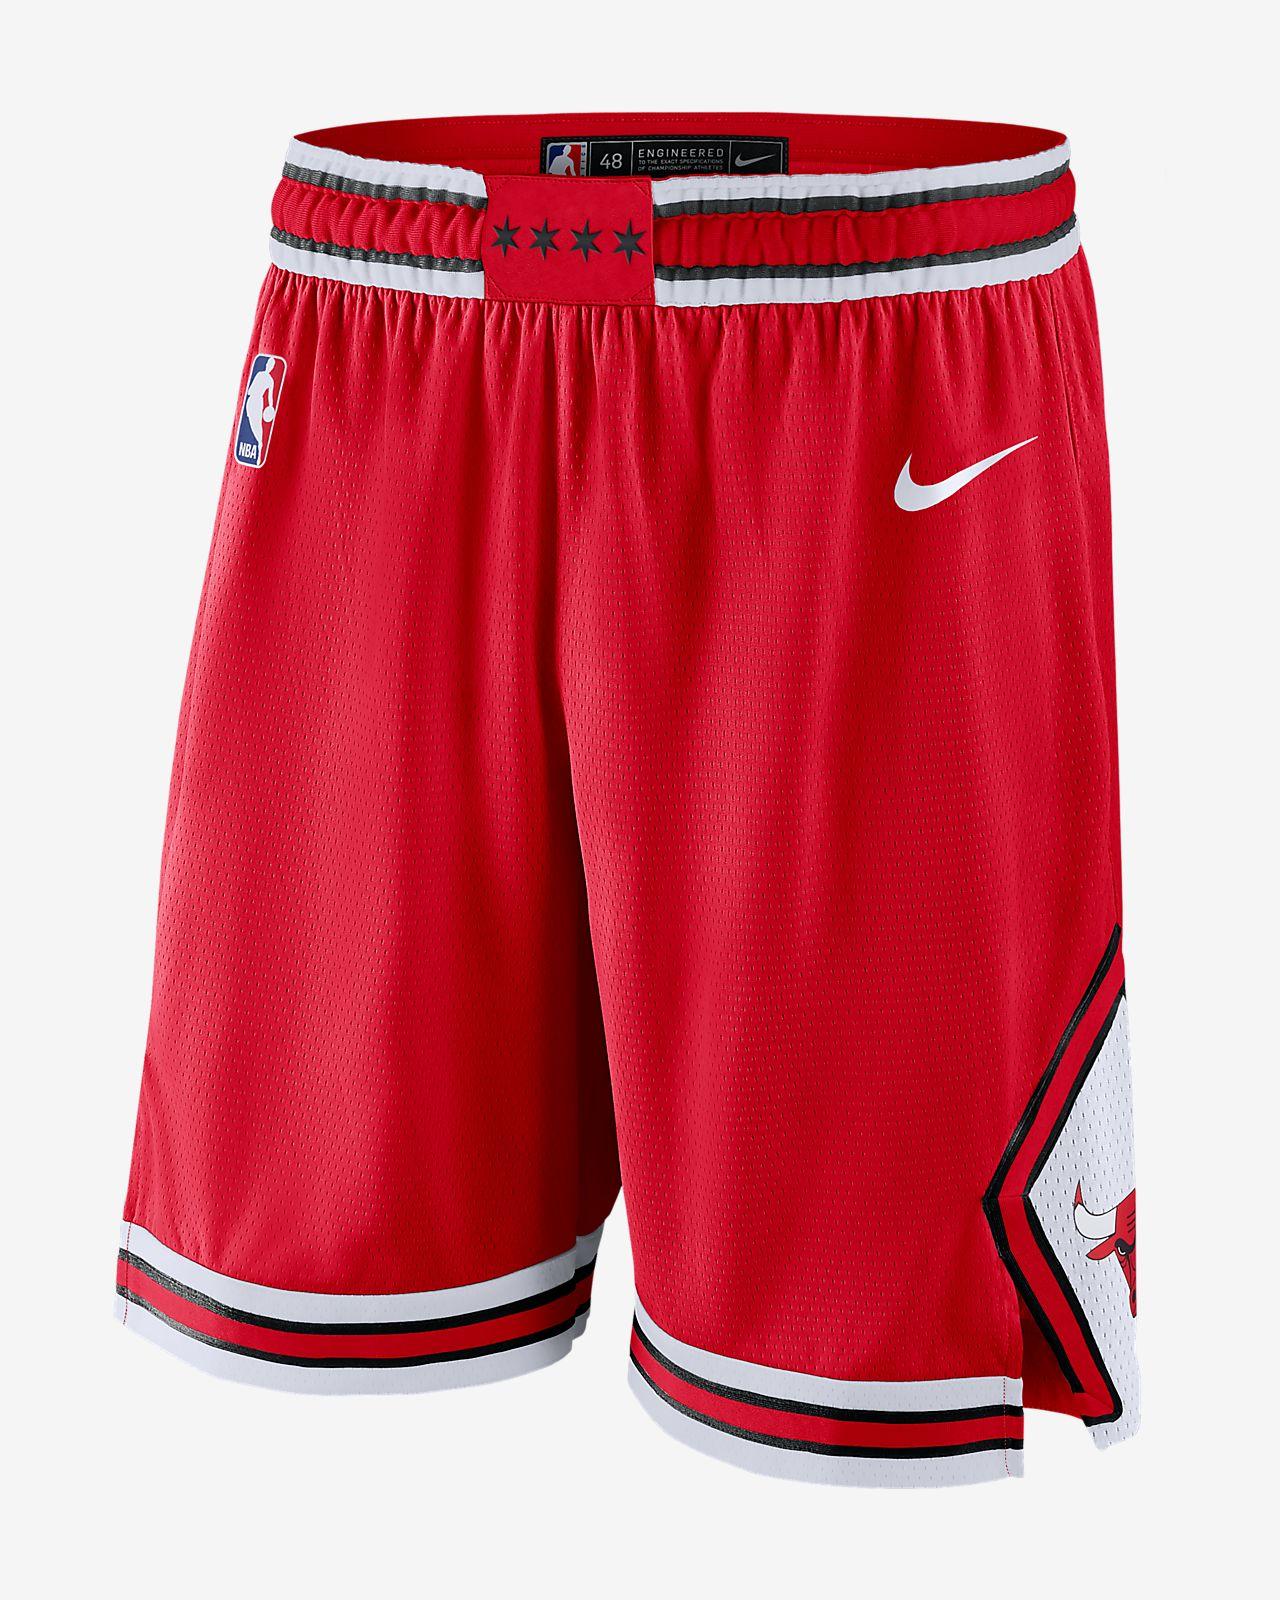 Chicago Bulls Icon Edition Swingman Men's Nike NBA Shorts